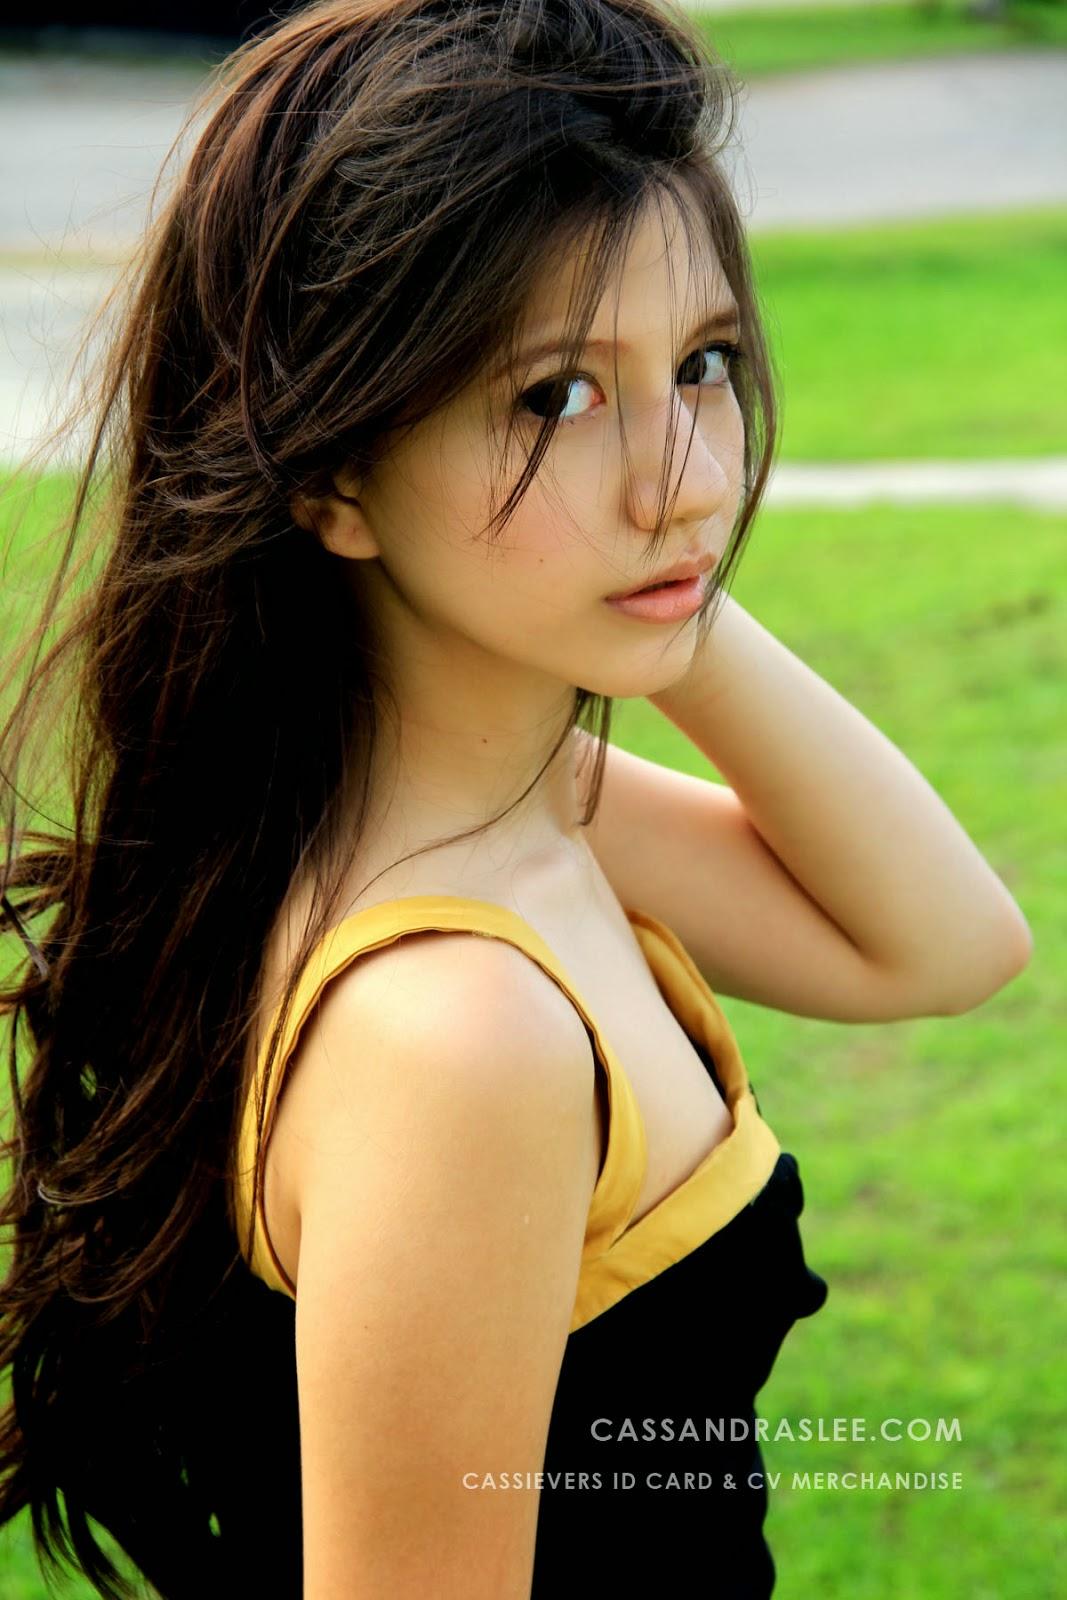 foto hot cassandra lee gaun hitam